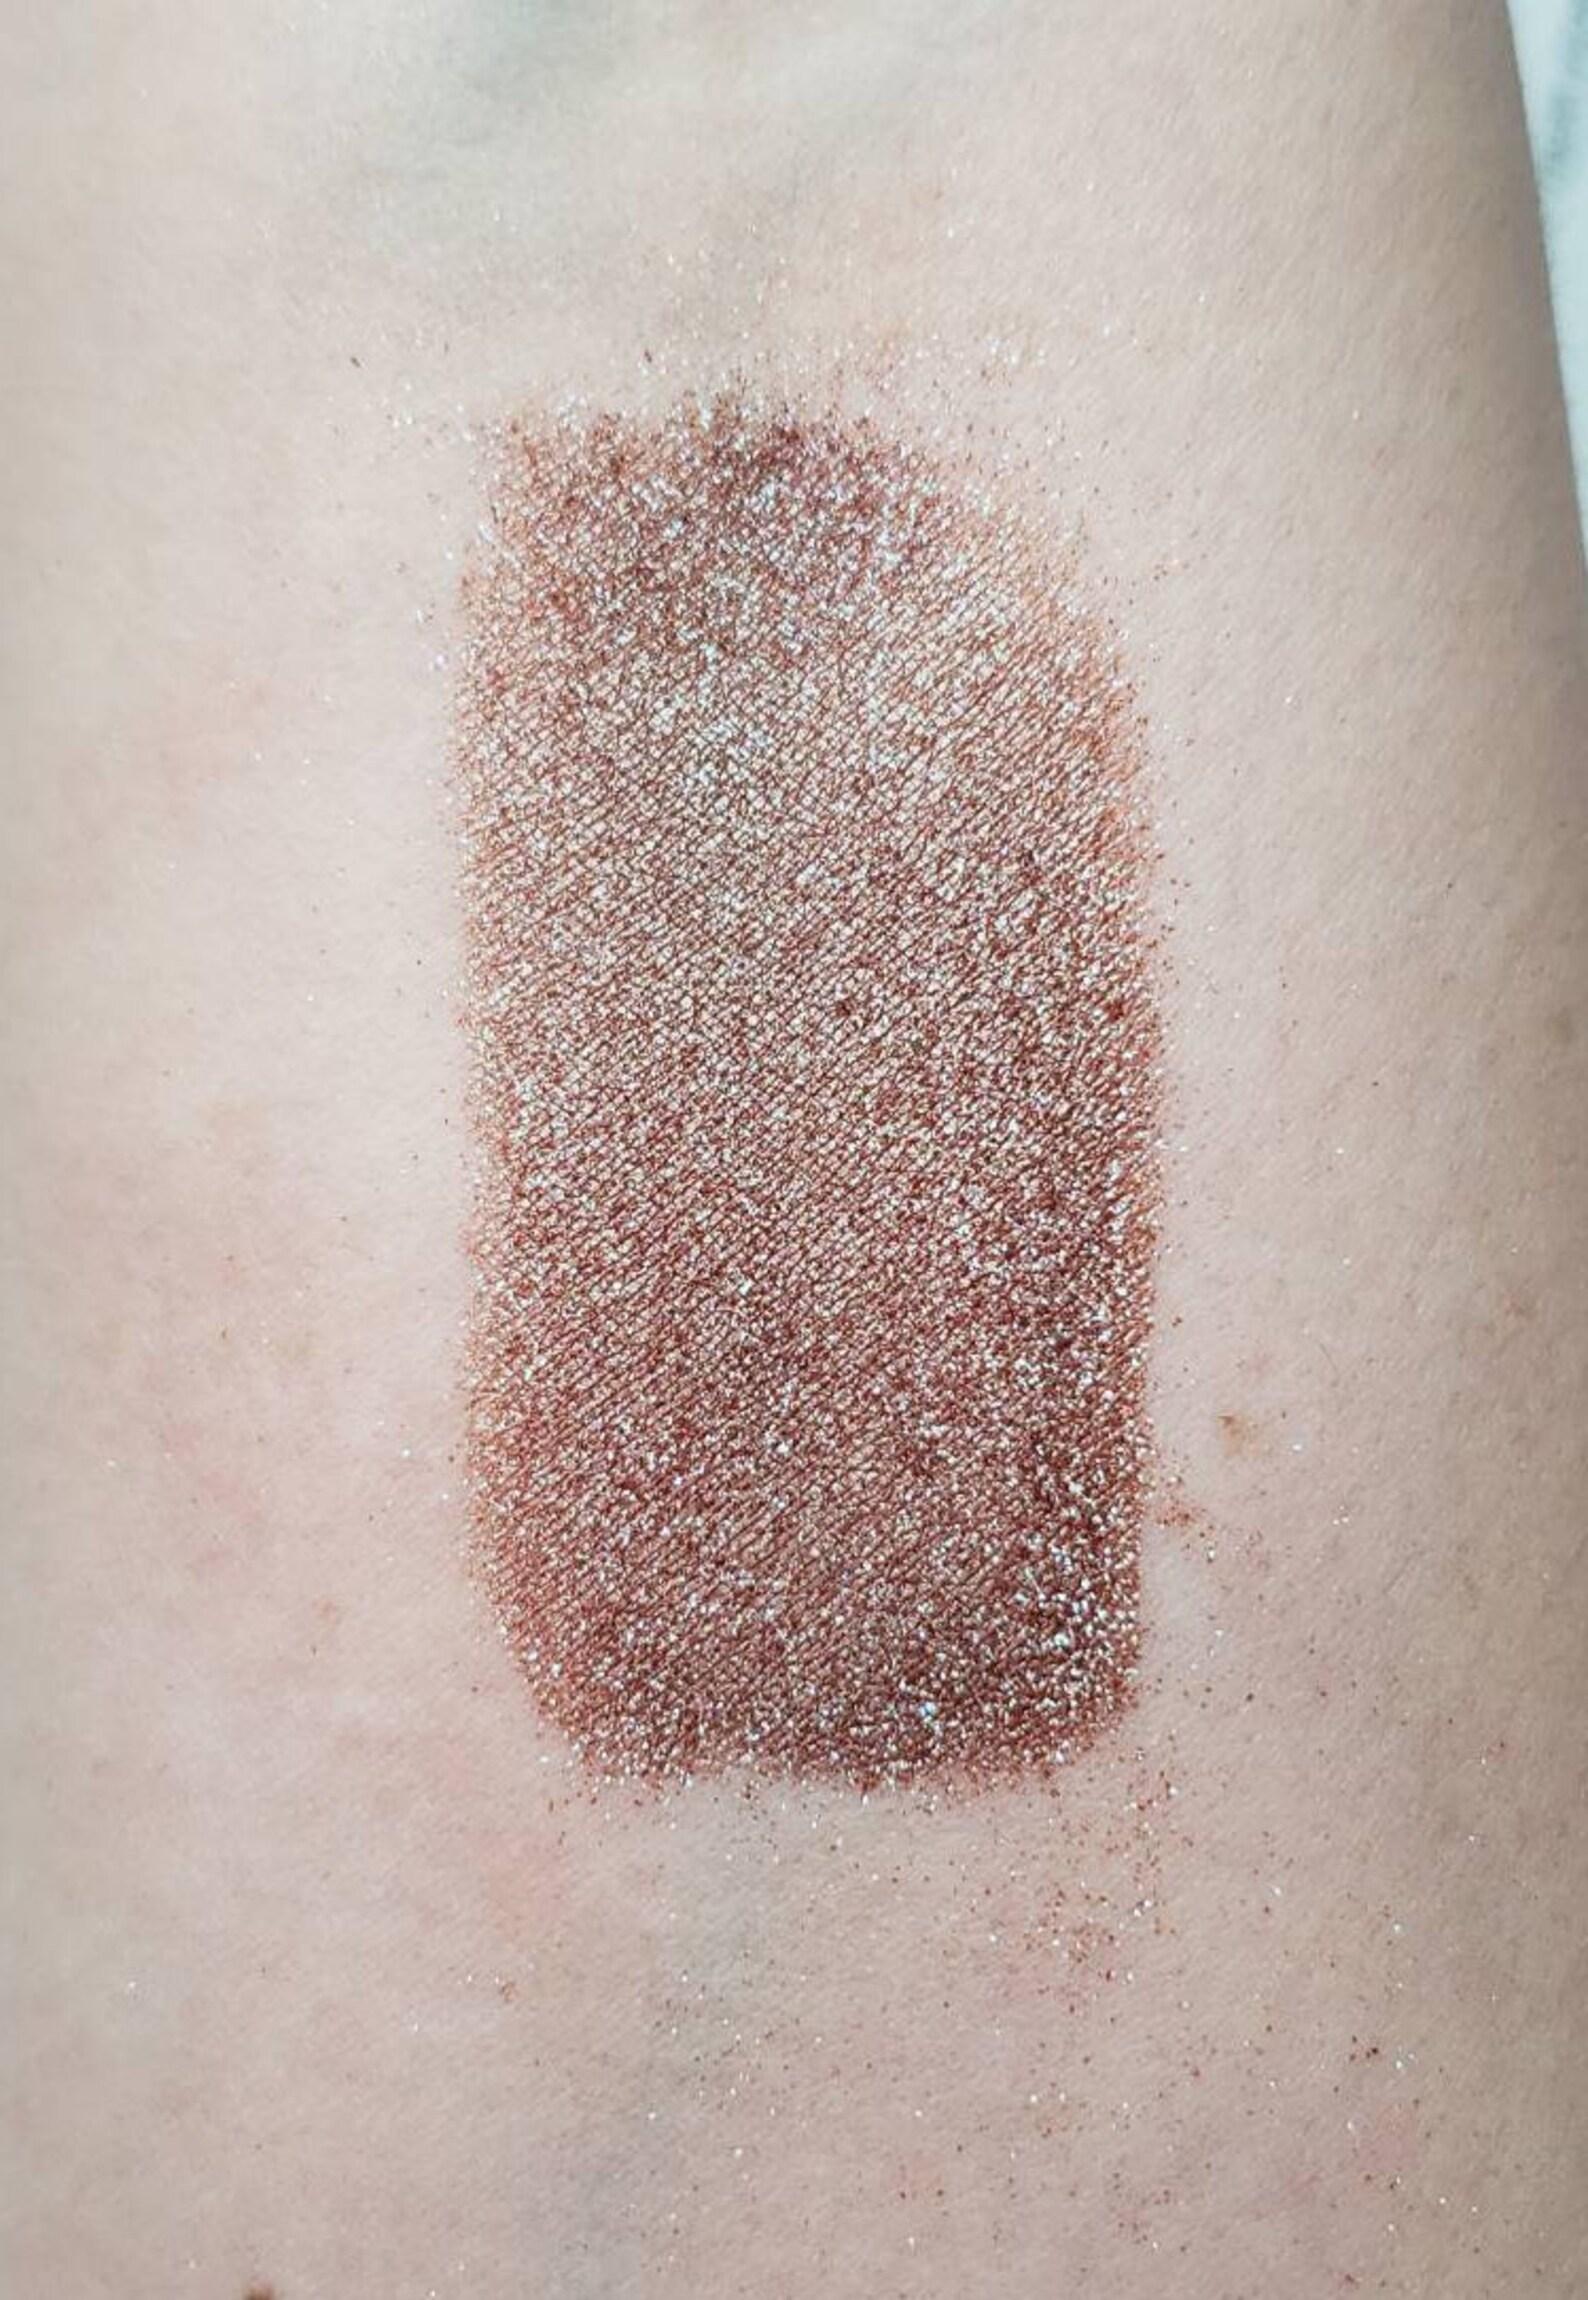 etsy.com - Dragon's Hoard - warm brown with blue and purple sparkles eyeshadow 5 gram VEGAN **Retiring**